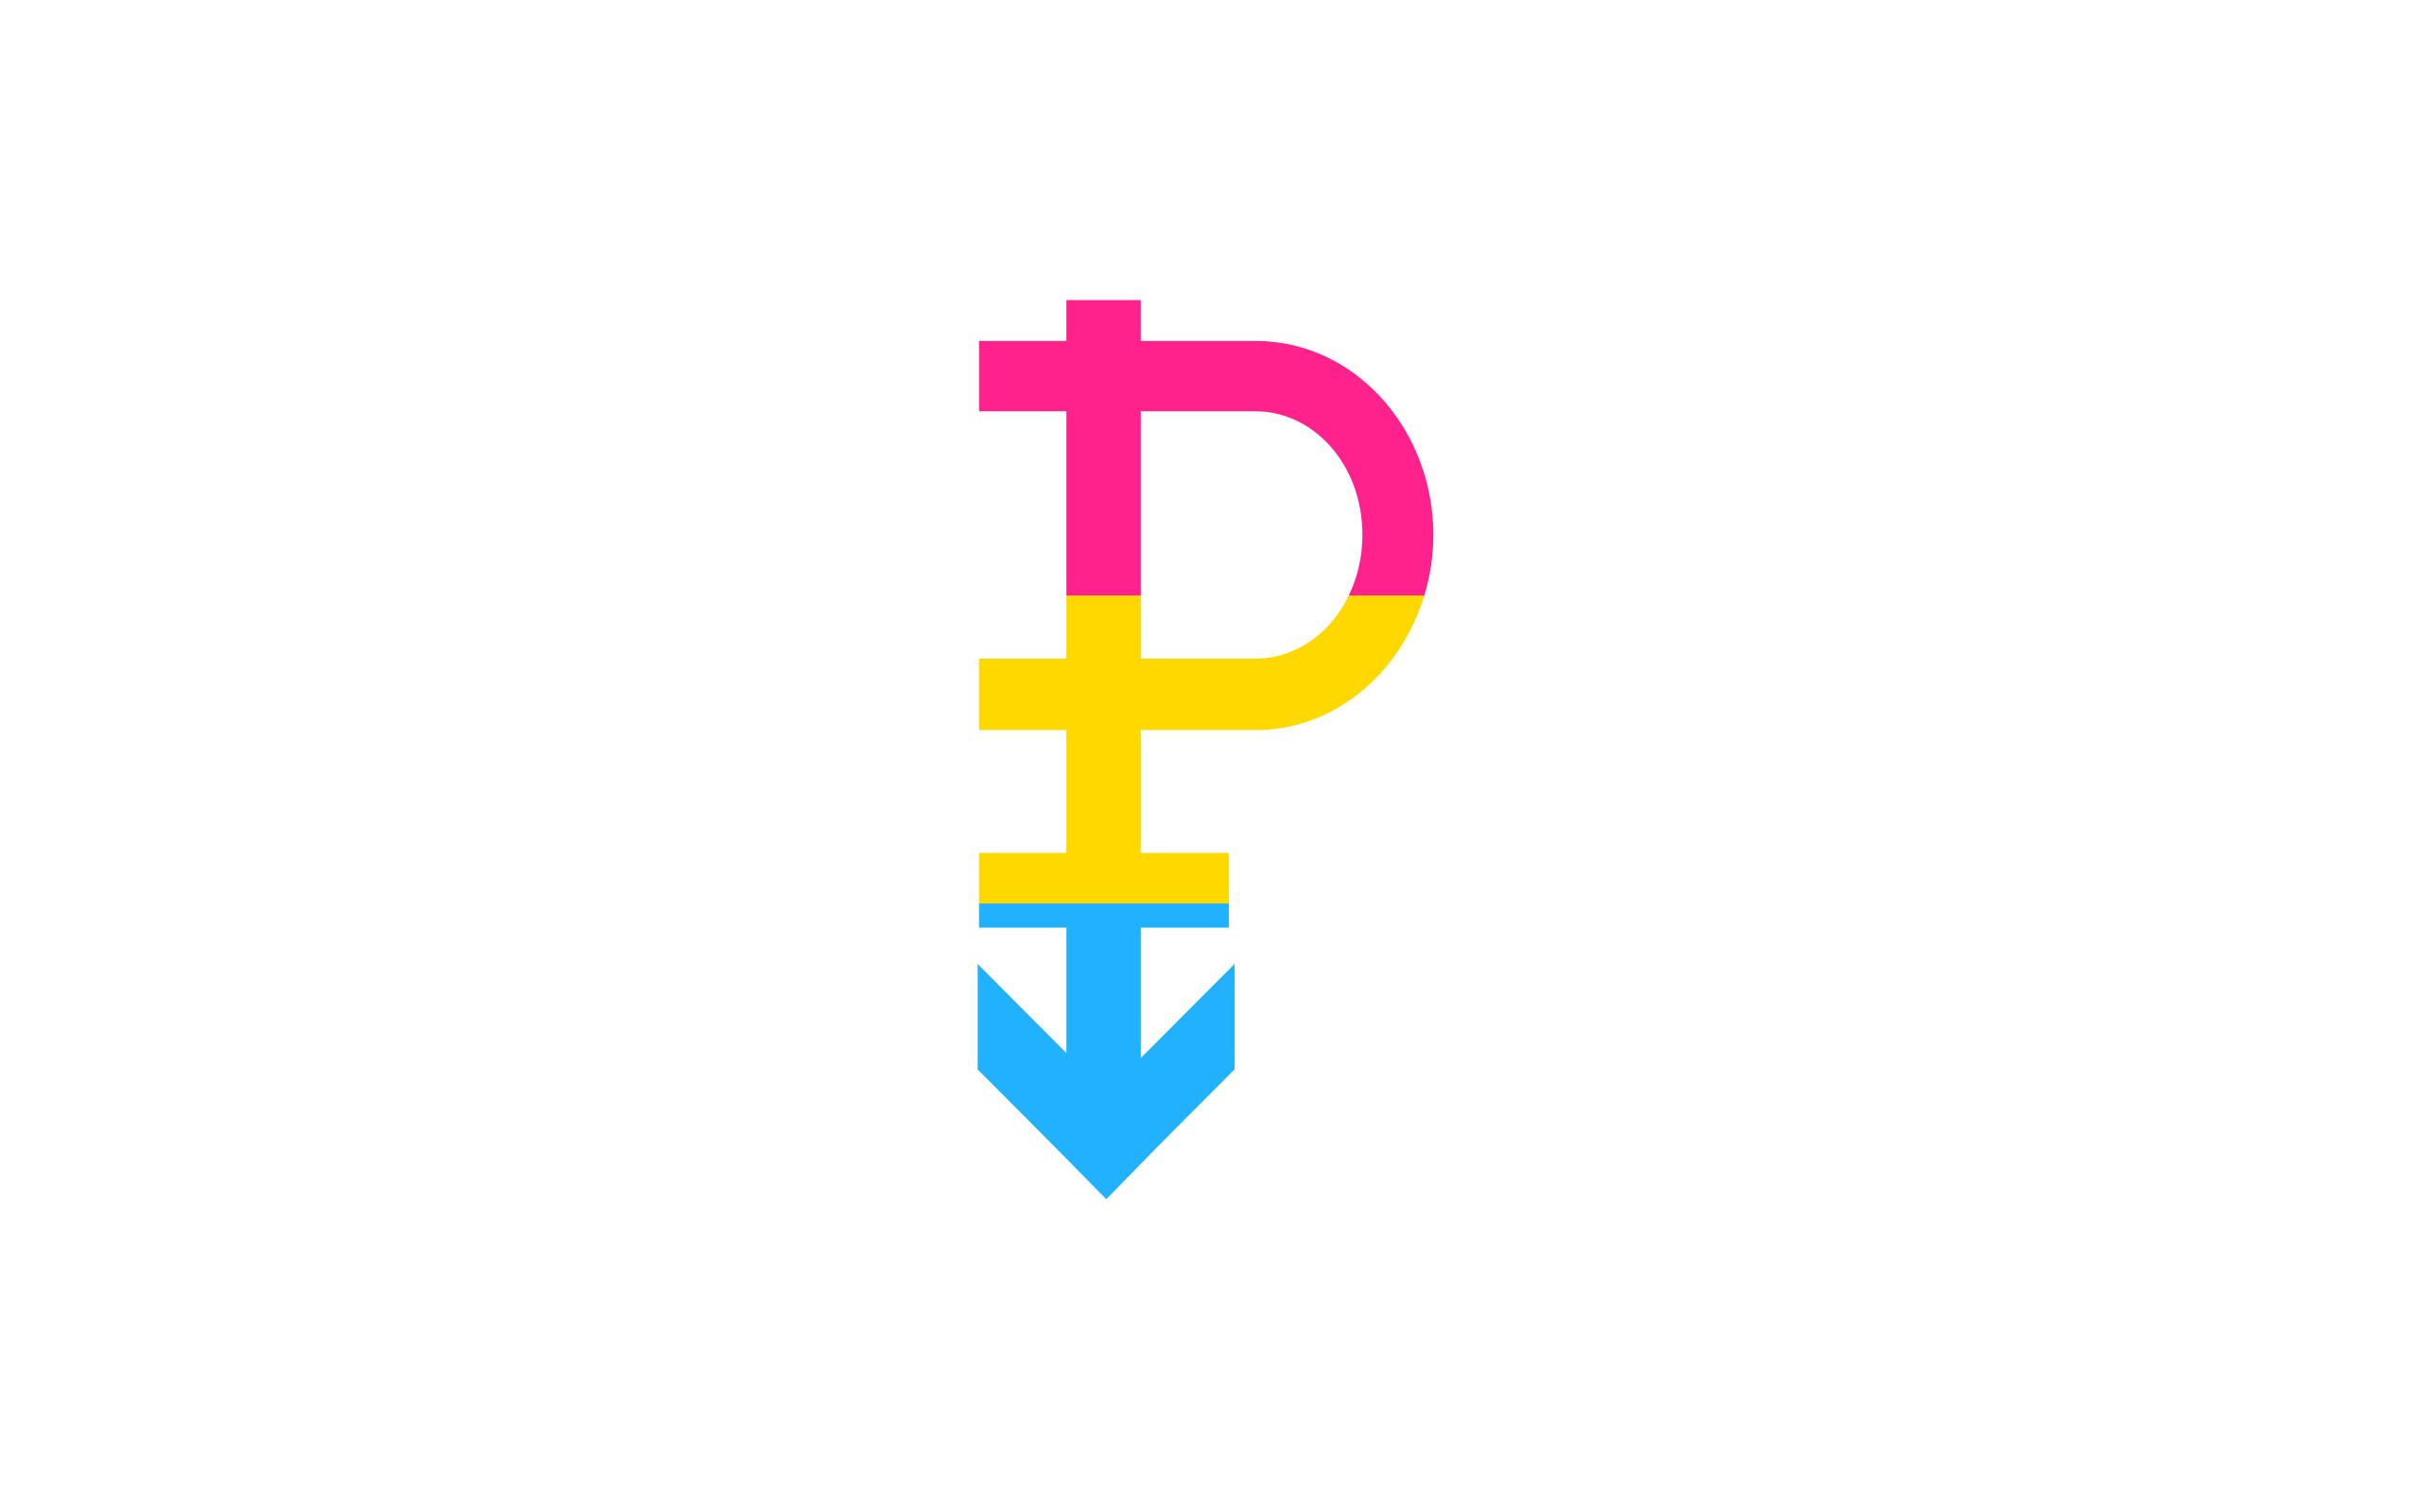 Pansexual symbol